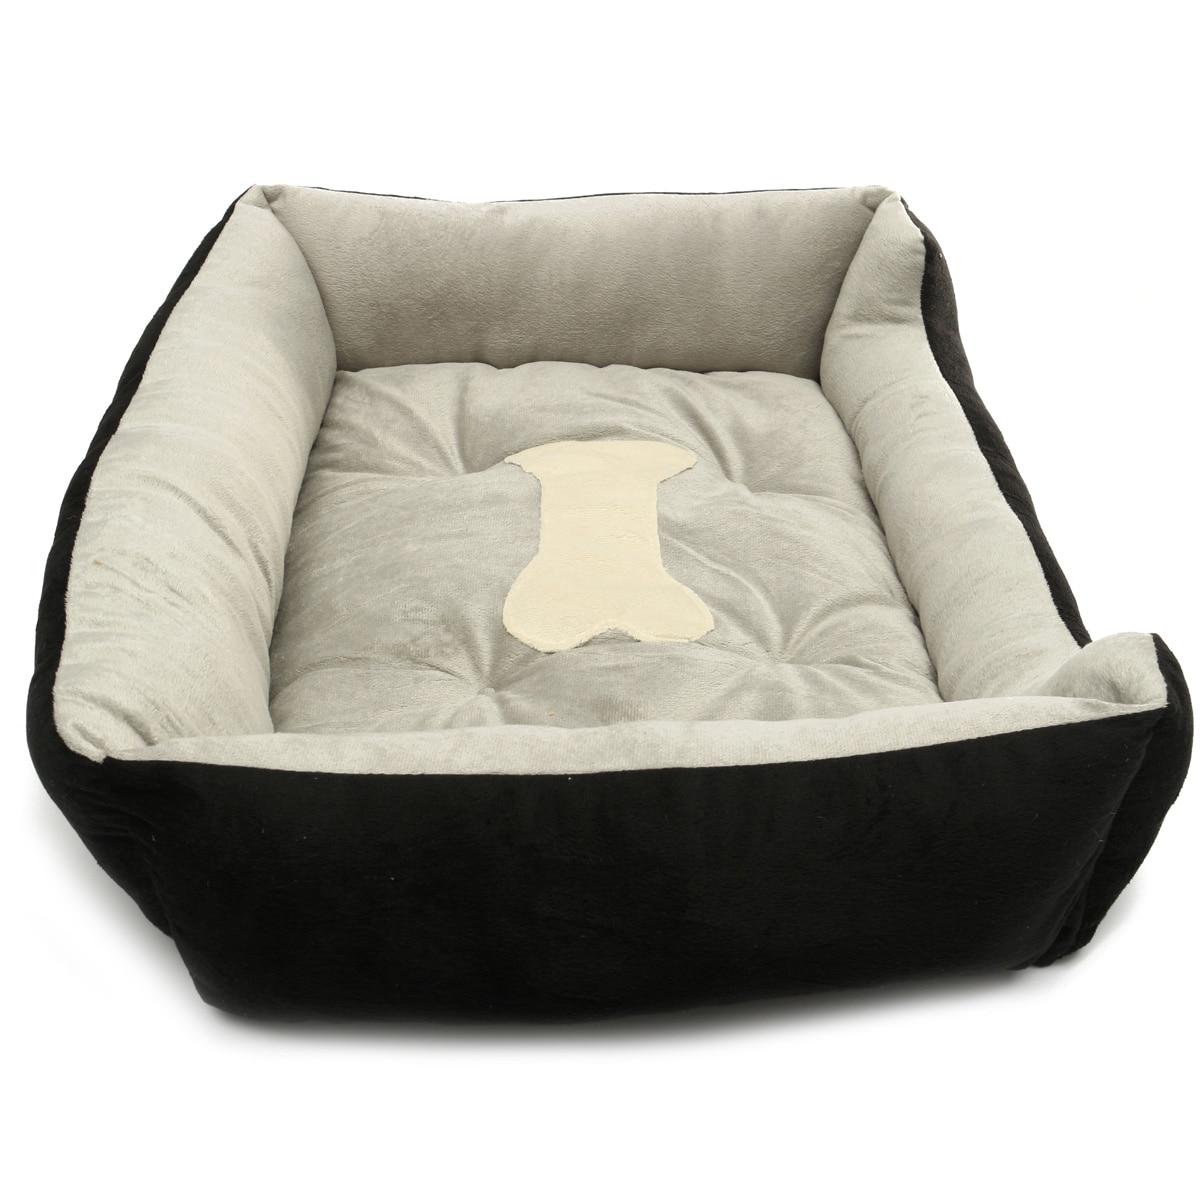 Bed For Dogs Warm Flannel Warm Waterproof Bottom Soft Fleece Warm Cat House Petshop Puppy Mats Kennel Play Rest Sleep Cushion 15